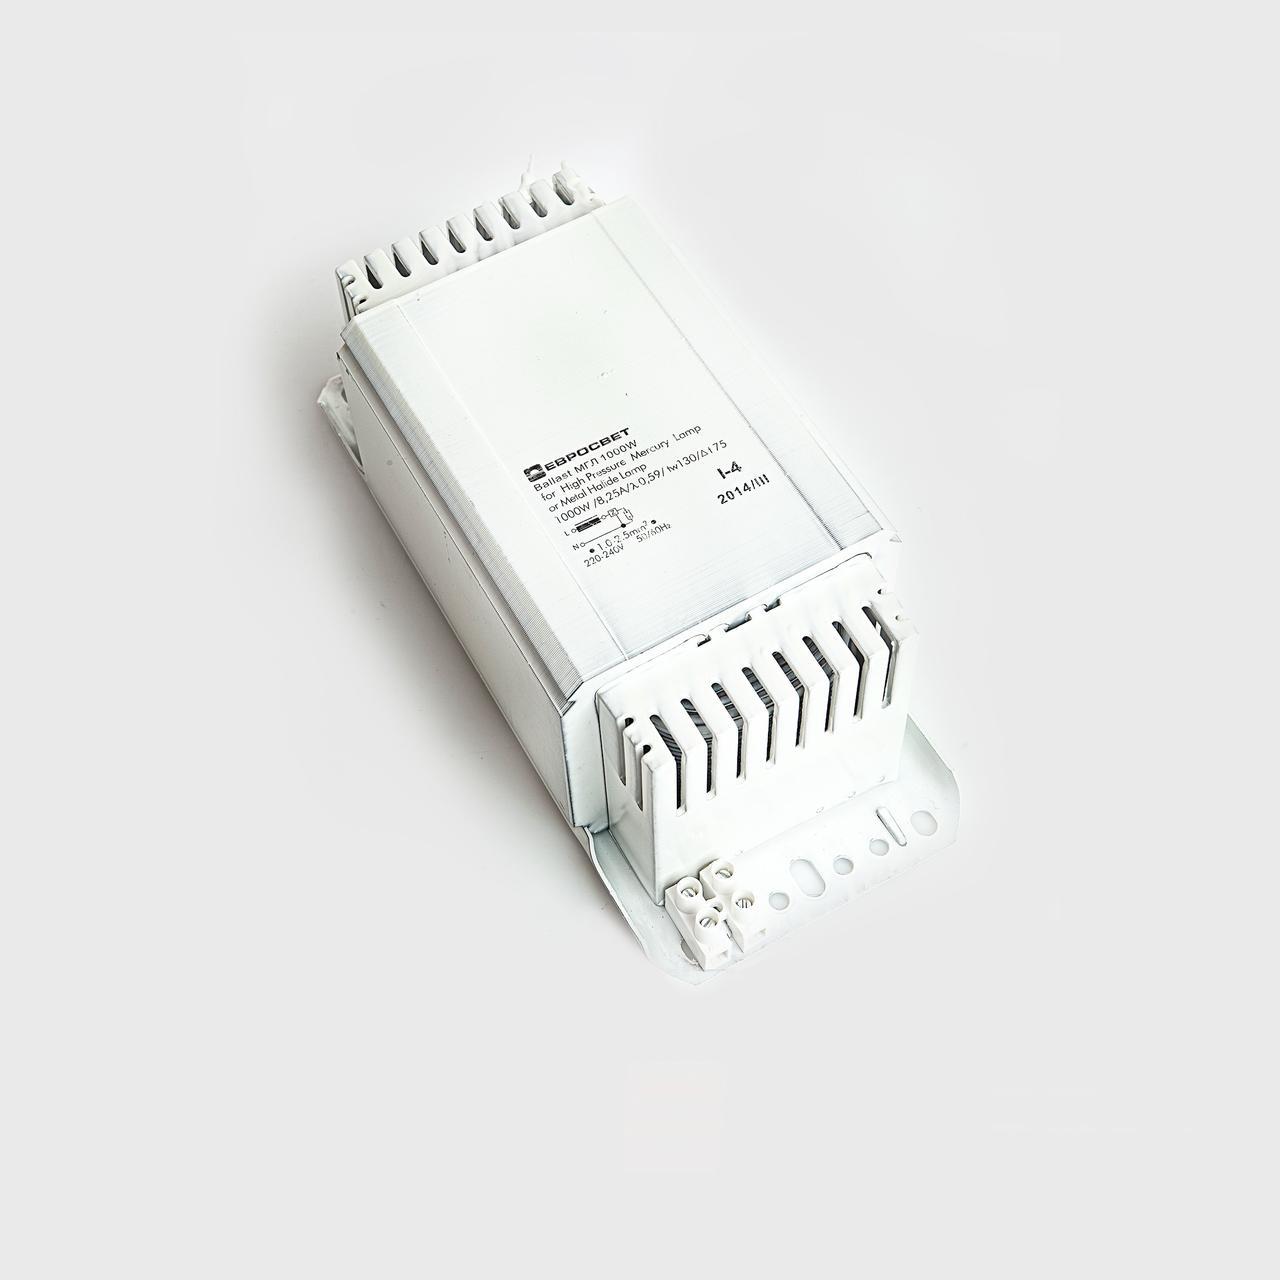 Балласт под металлогалогенную и ртутную лампу МГЛ  ДРЛ 1000Вт